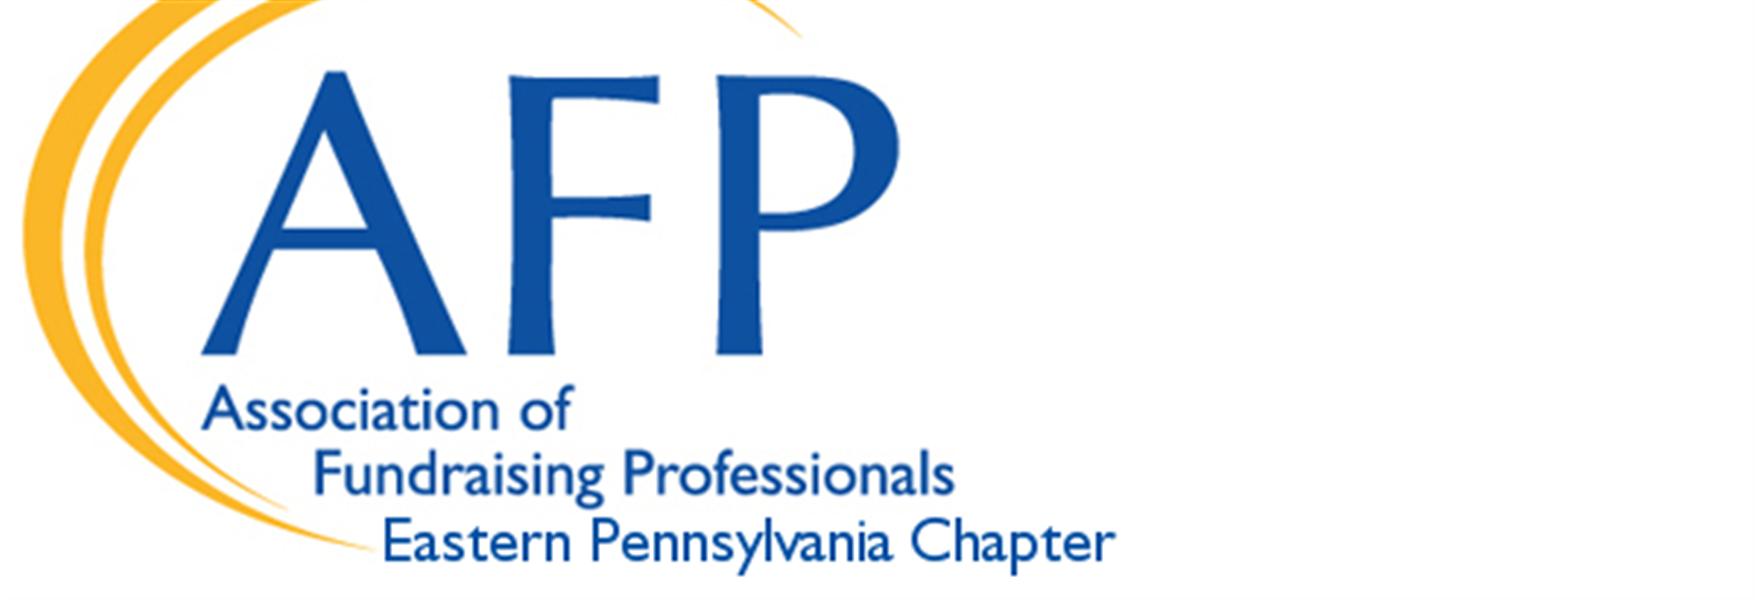 e265fccf-1138-4a7e-abe0-47e4488d0aa3_AFP - EPA Logo.php.png